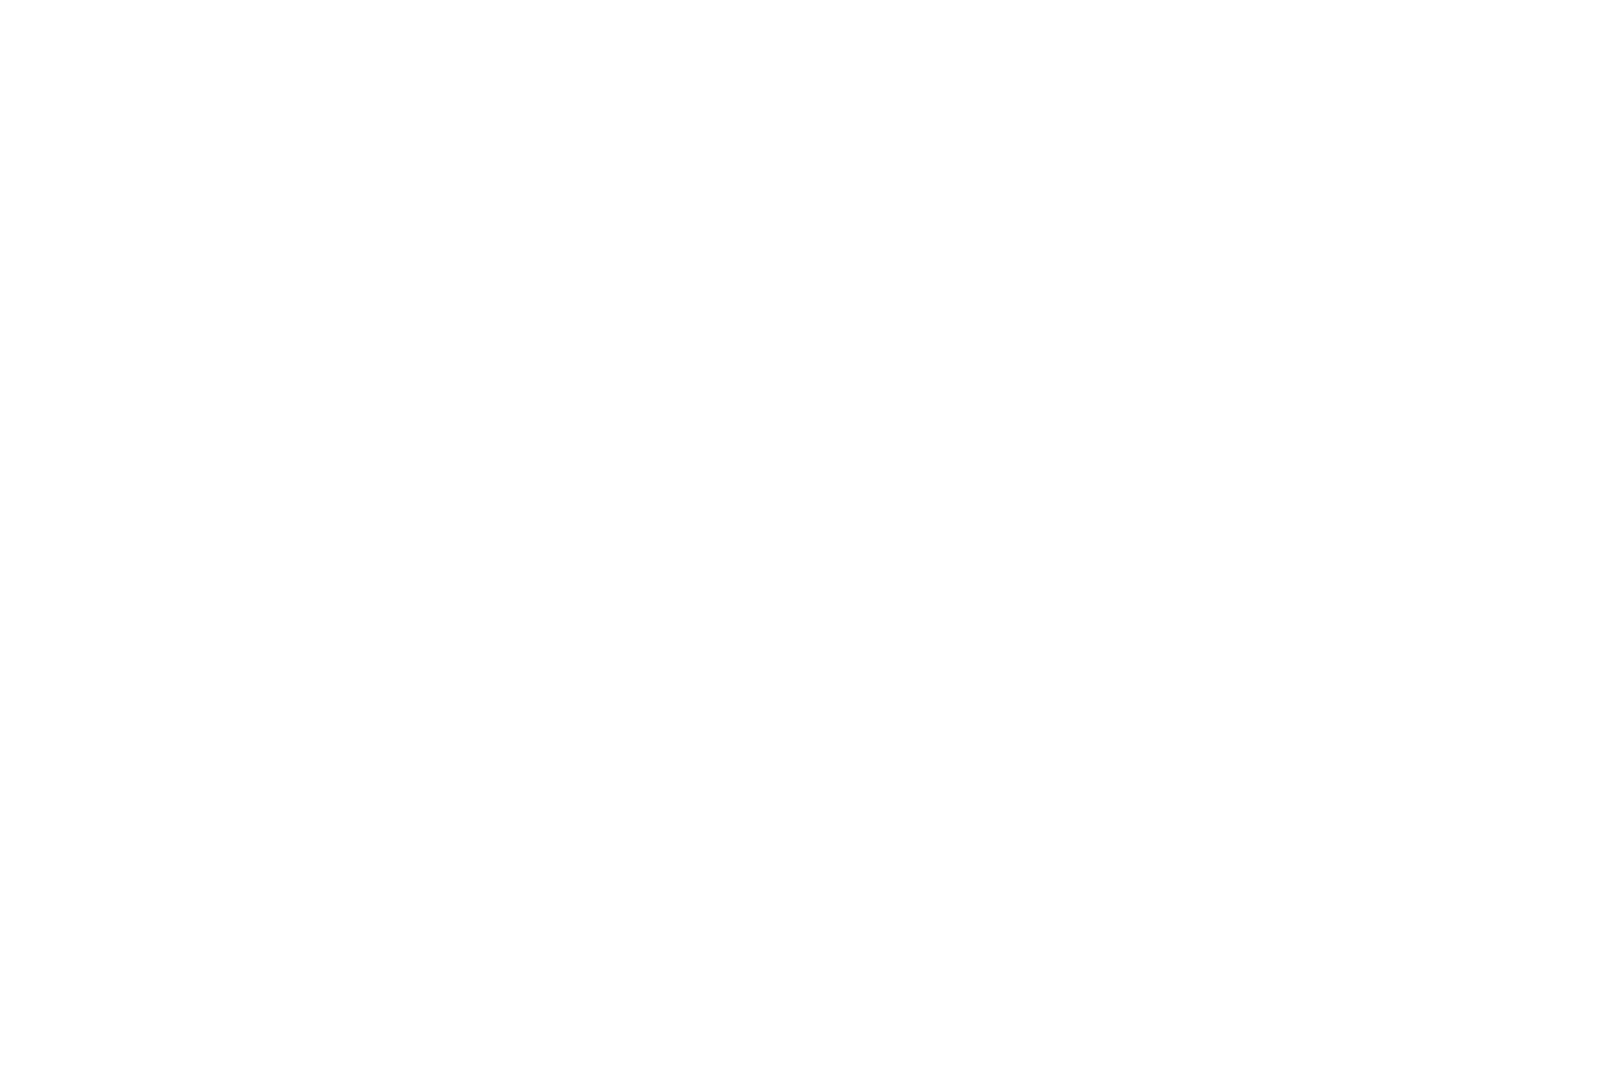 充血監督の深夜の運動会Vol.10 OL女体  94連発 28